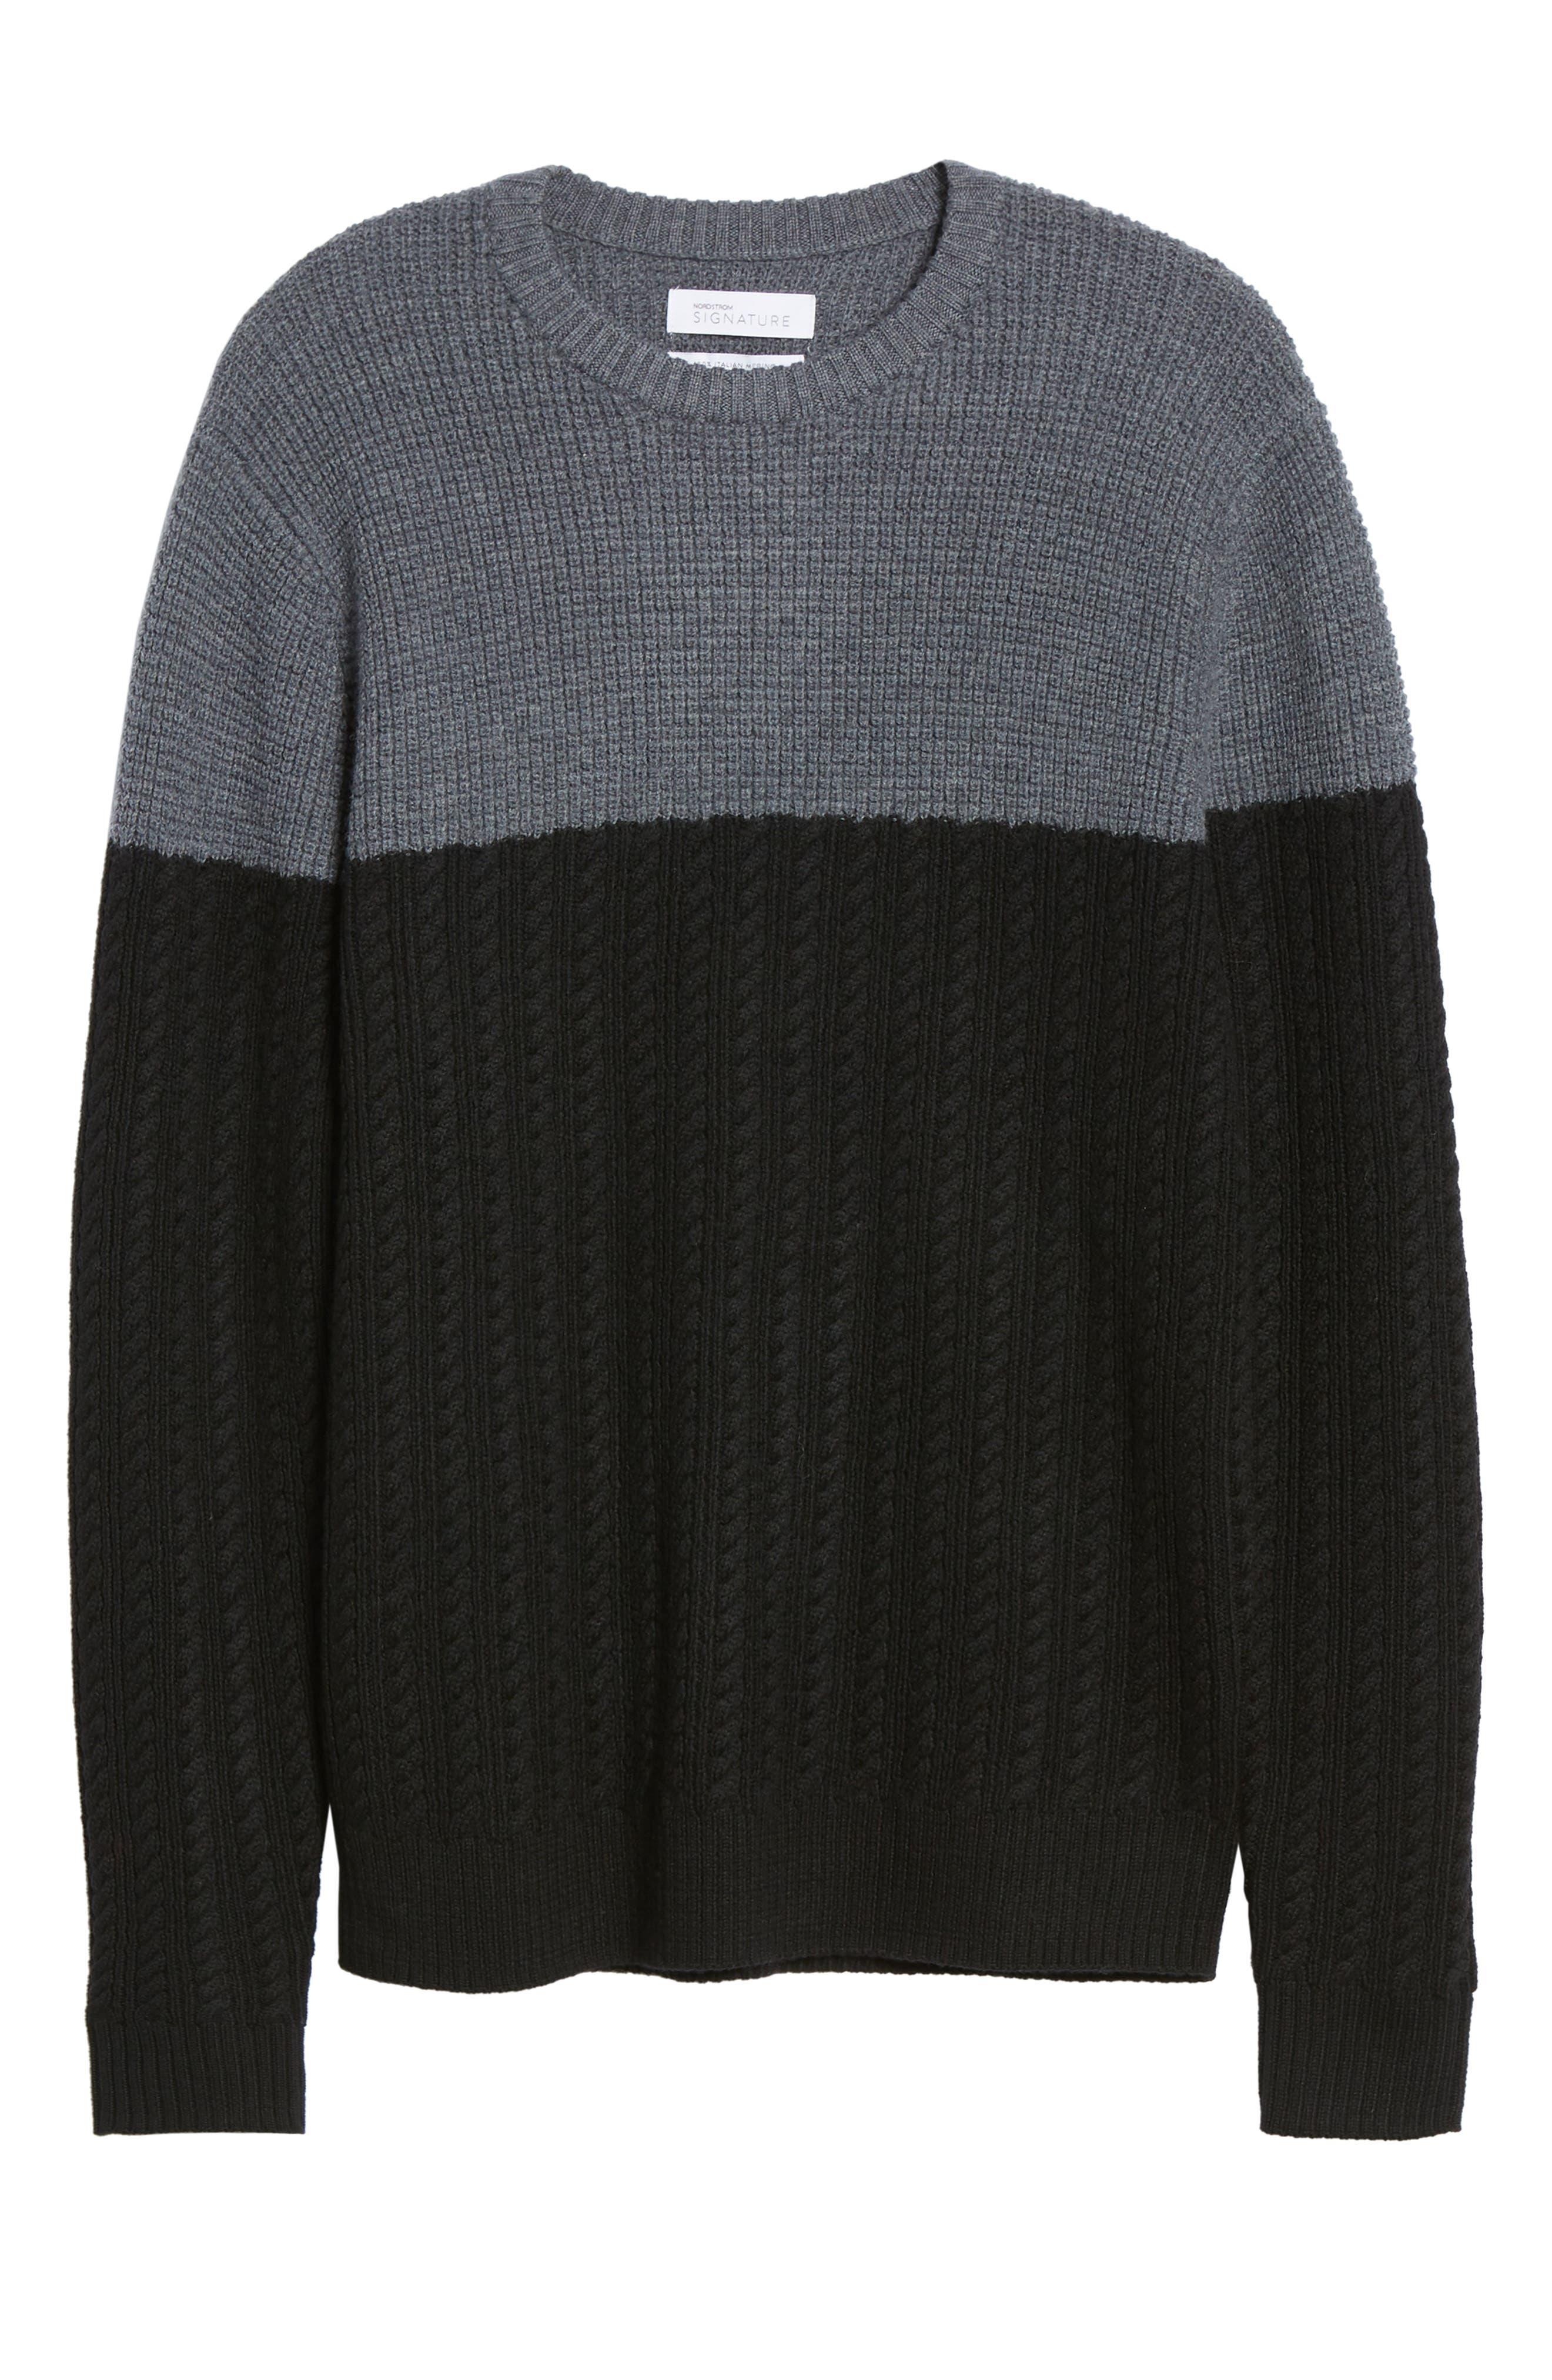 Block Merino Wool Cable Knit Sweater,                             Alternate thumbnail 6, color,                             BLACK CAVIAR COLORBLOCK